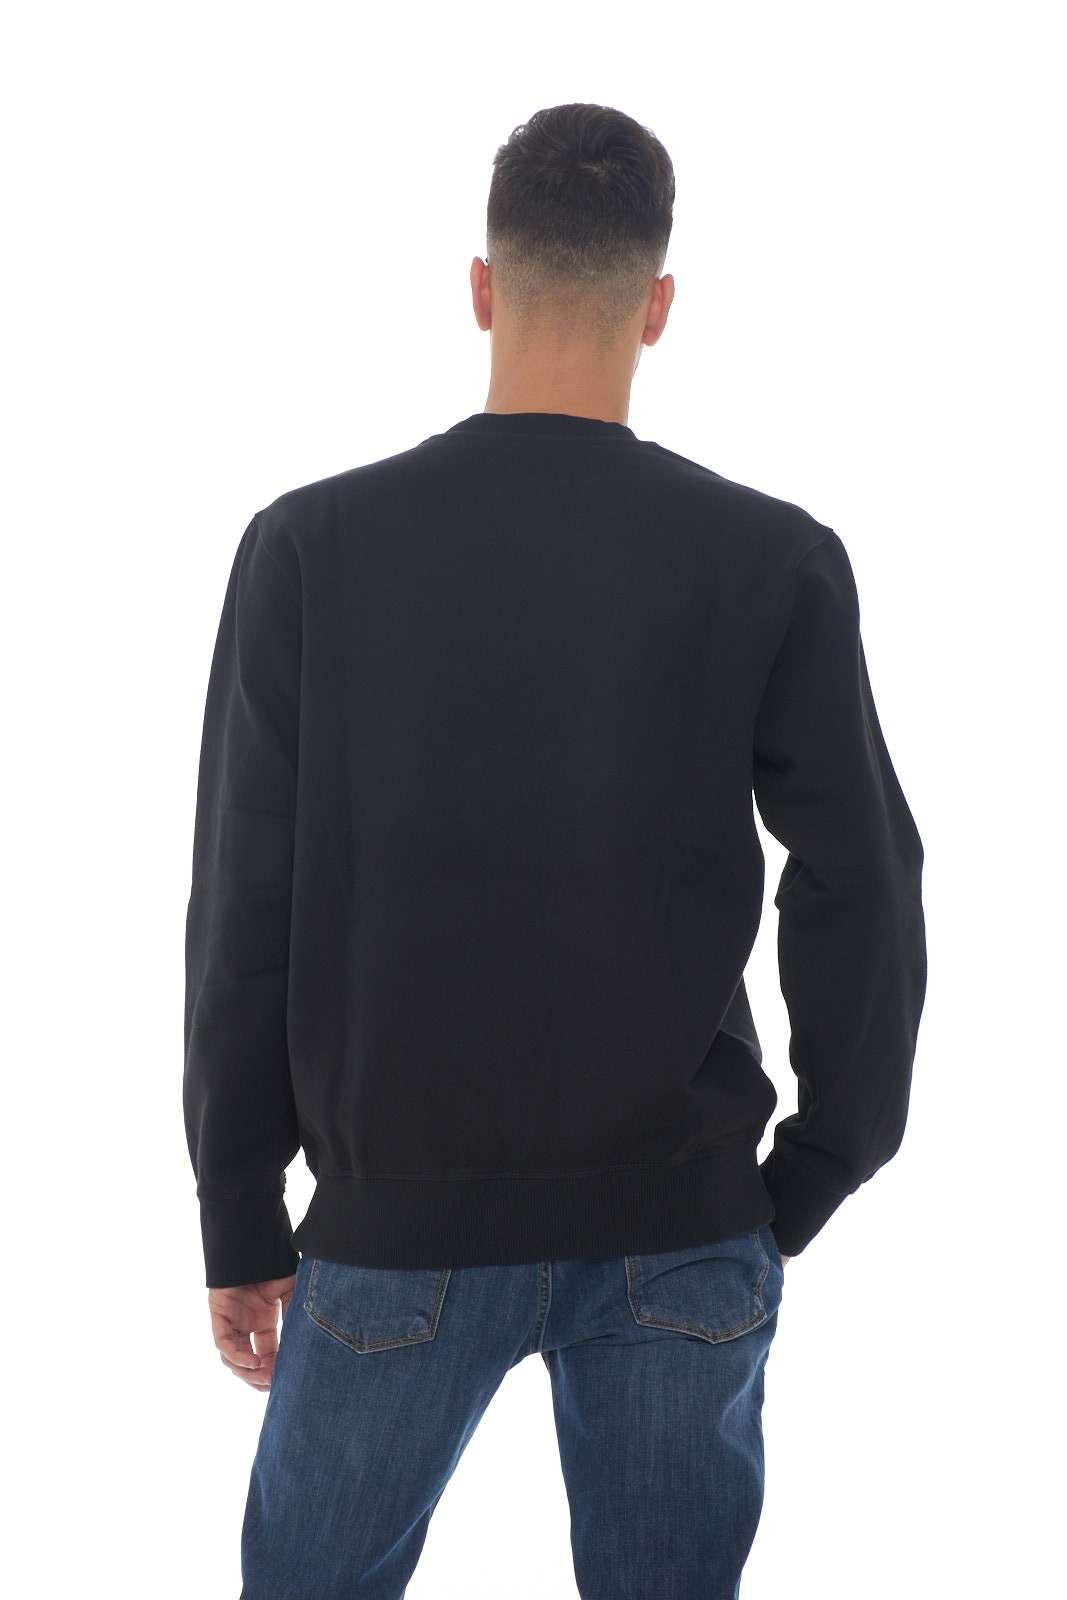 https://www.parmax.com/media/catalog/product/a/i/AI-outlet_parmax-felpa-uomo-Napapijri-N0YIV9-C.jpg